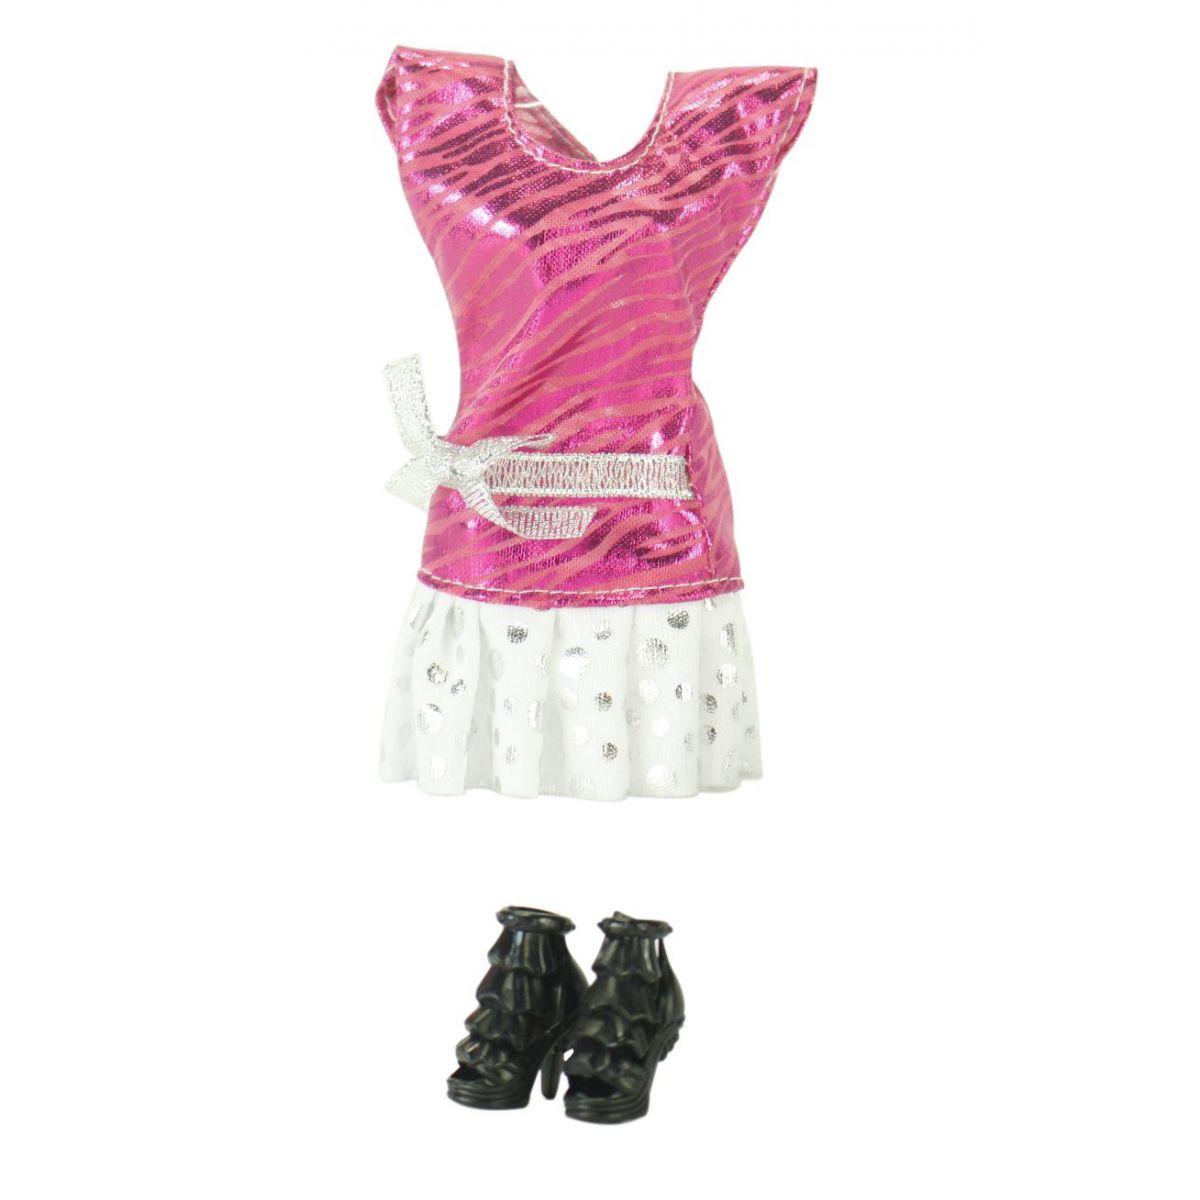 EP Line Šatičky pro panenky s doplňky Růžové šaty s bílou sukní